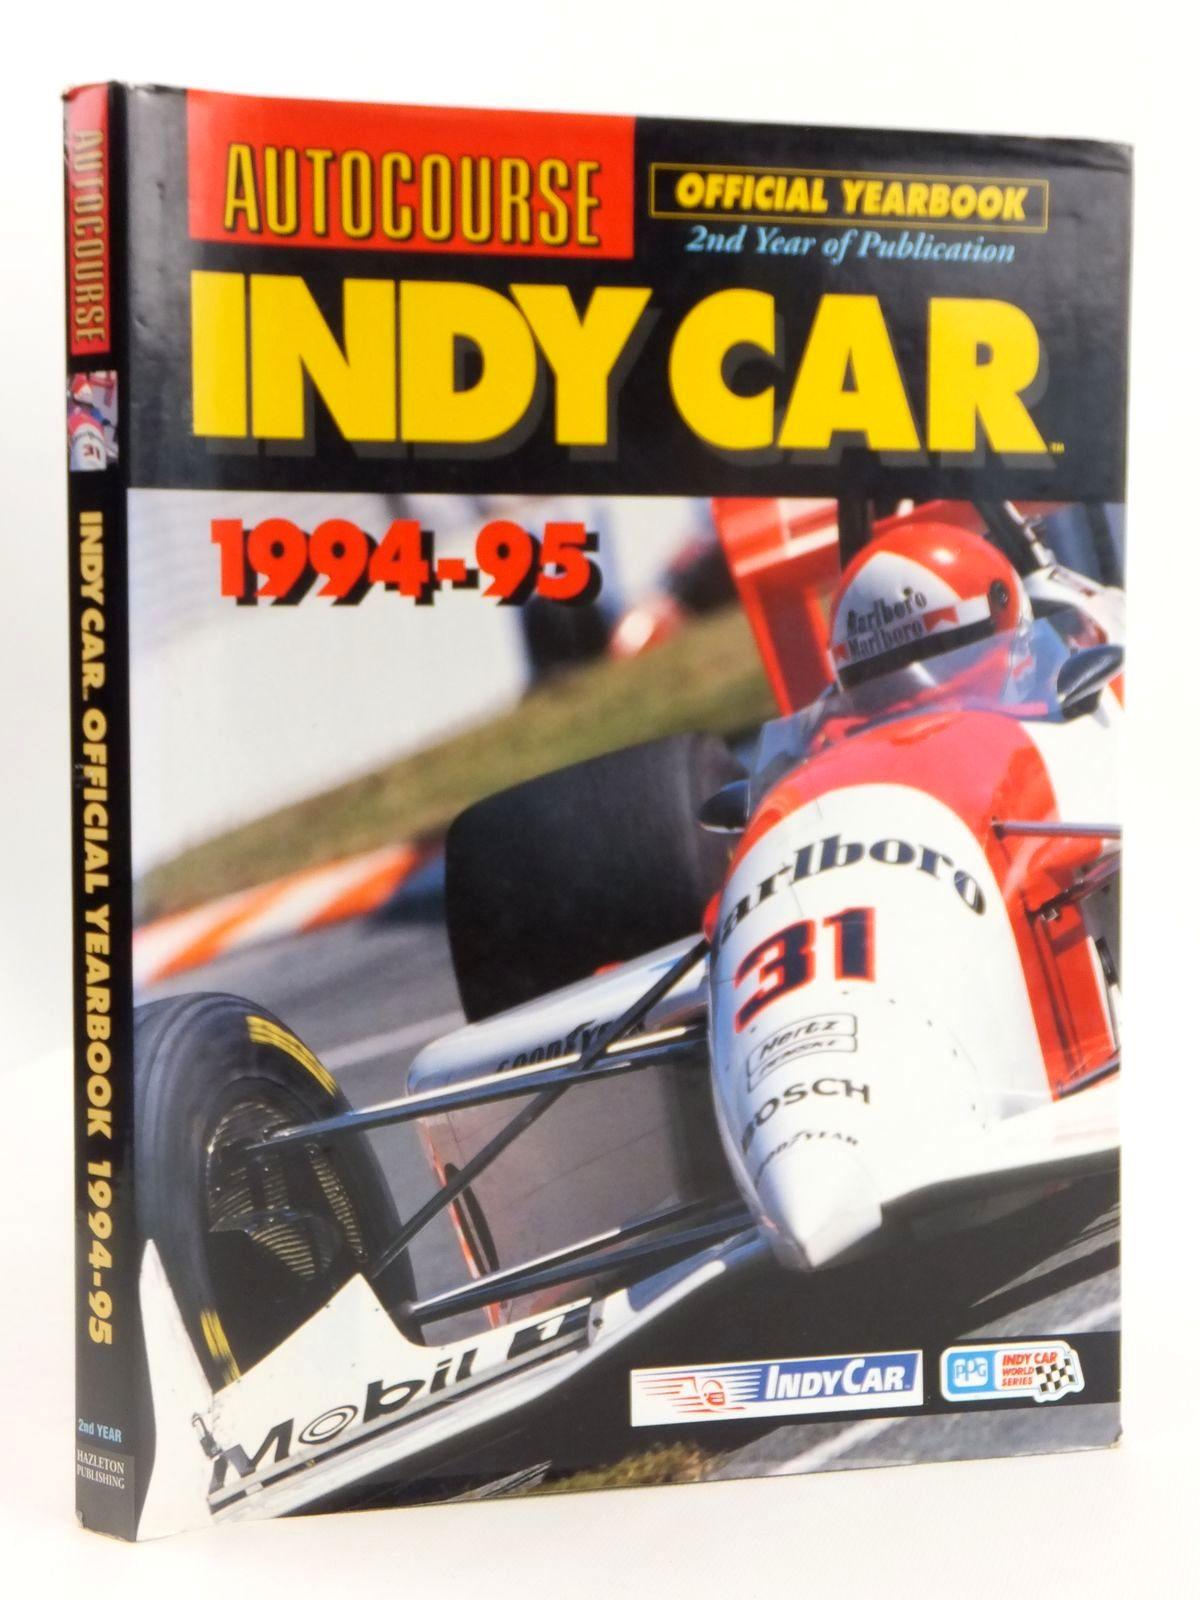 Photo of AUTOCOURSE INDY CAR 1994-95